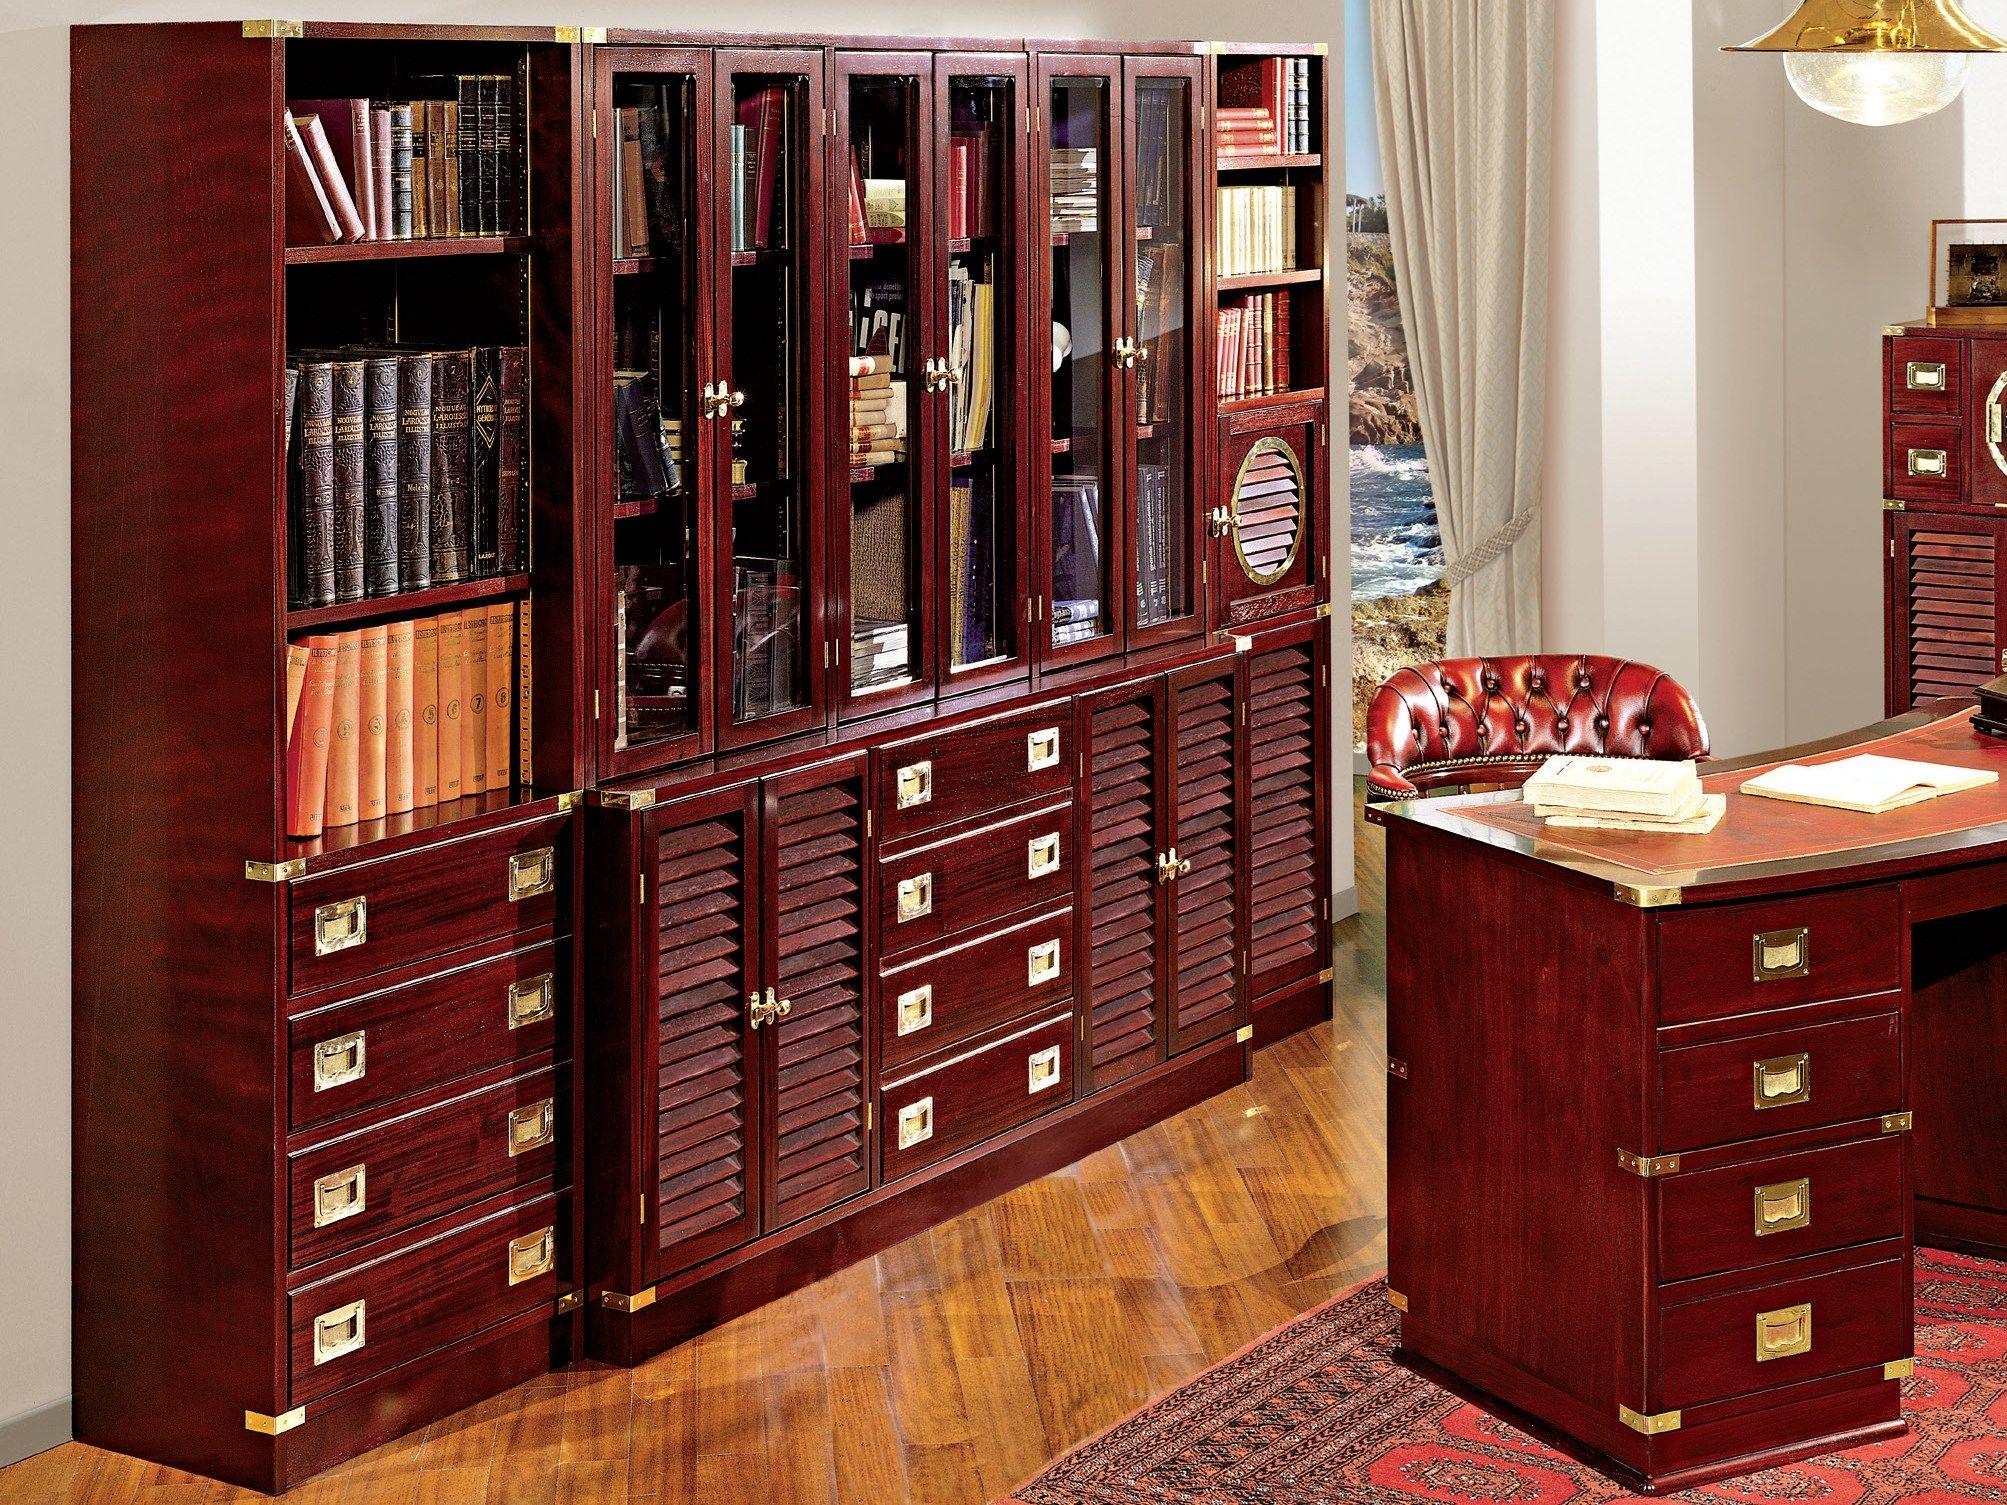 Книжный шкаф из древесины и стекла vecchia maria, caroti - м.